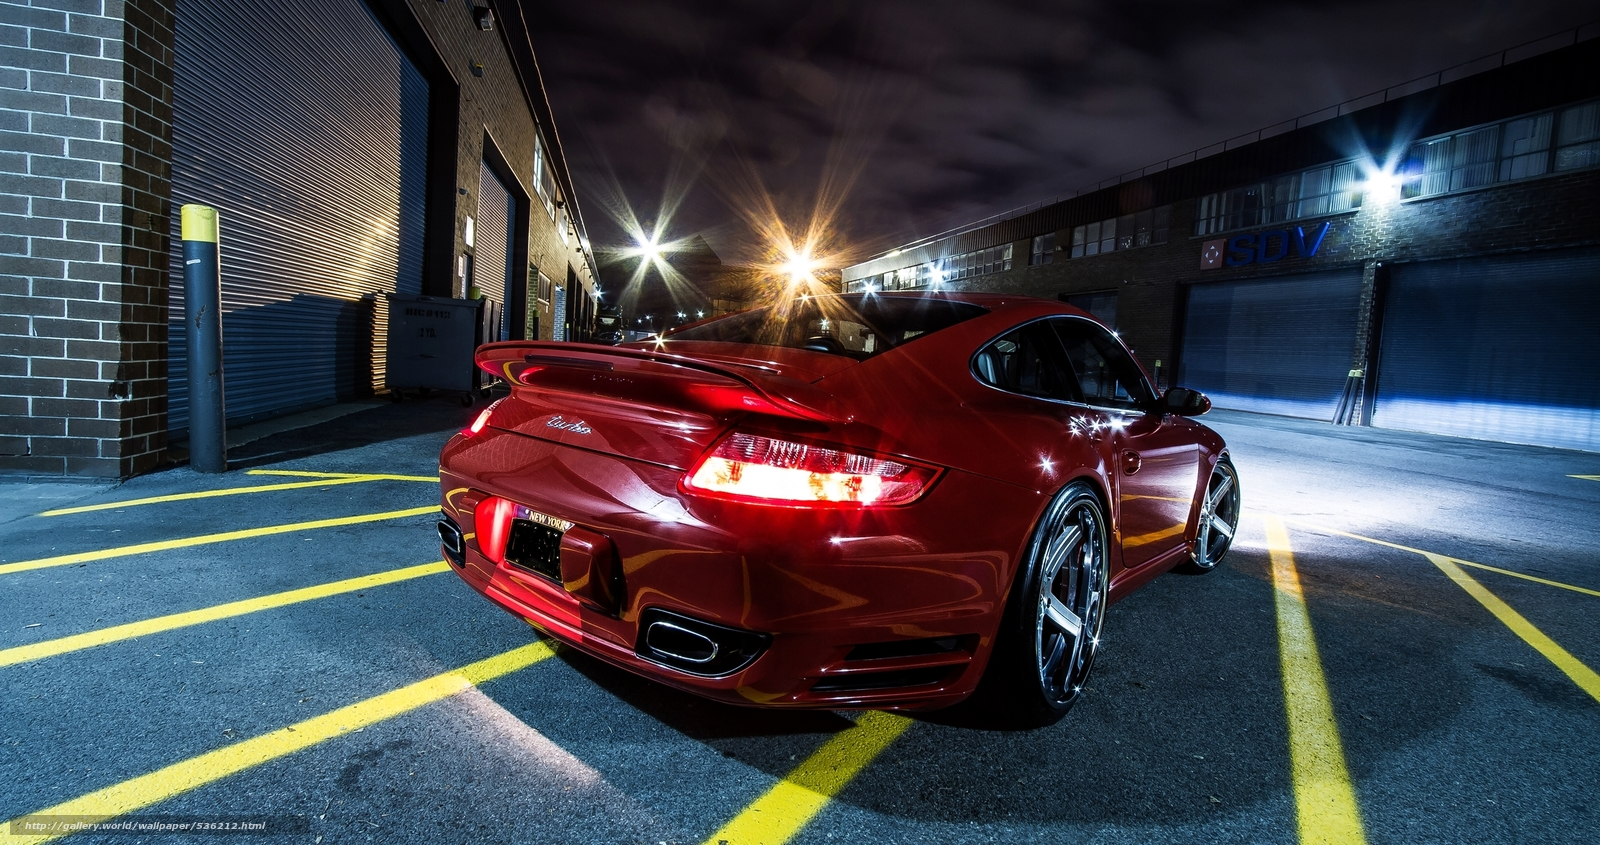 Porsche, Ночь, Красный, Бампер, …